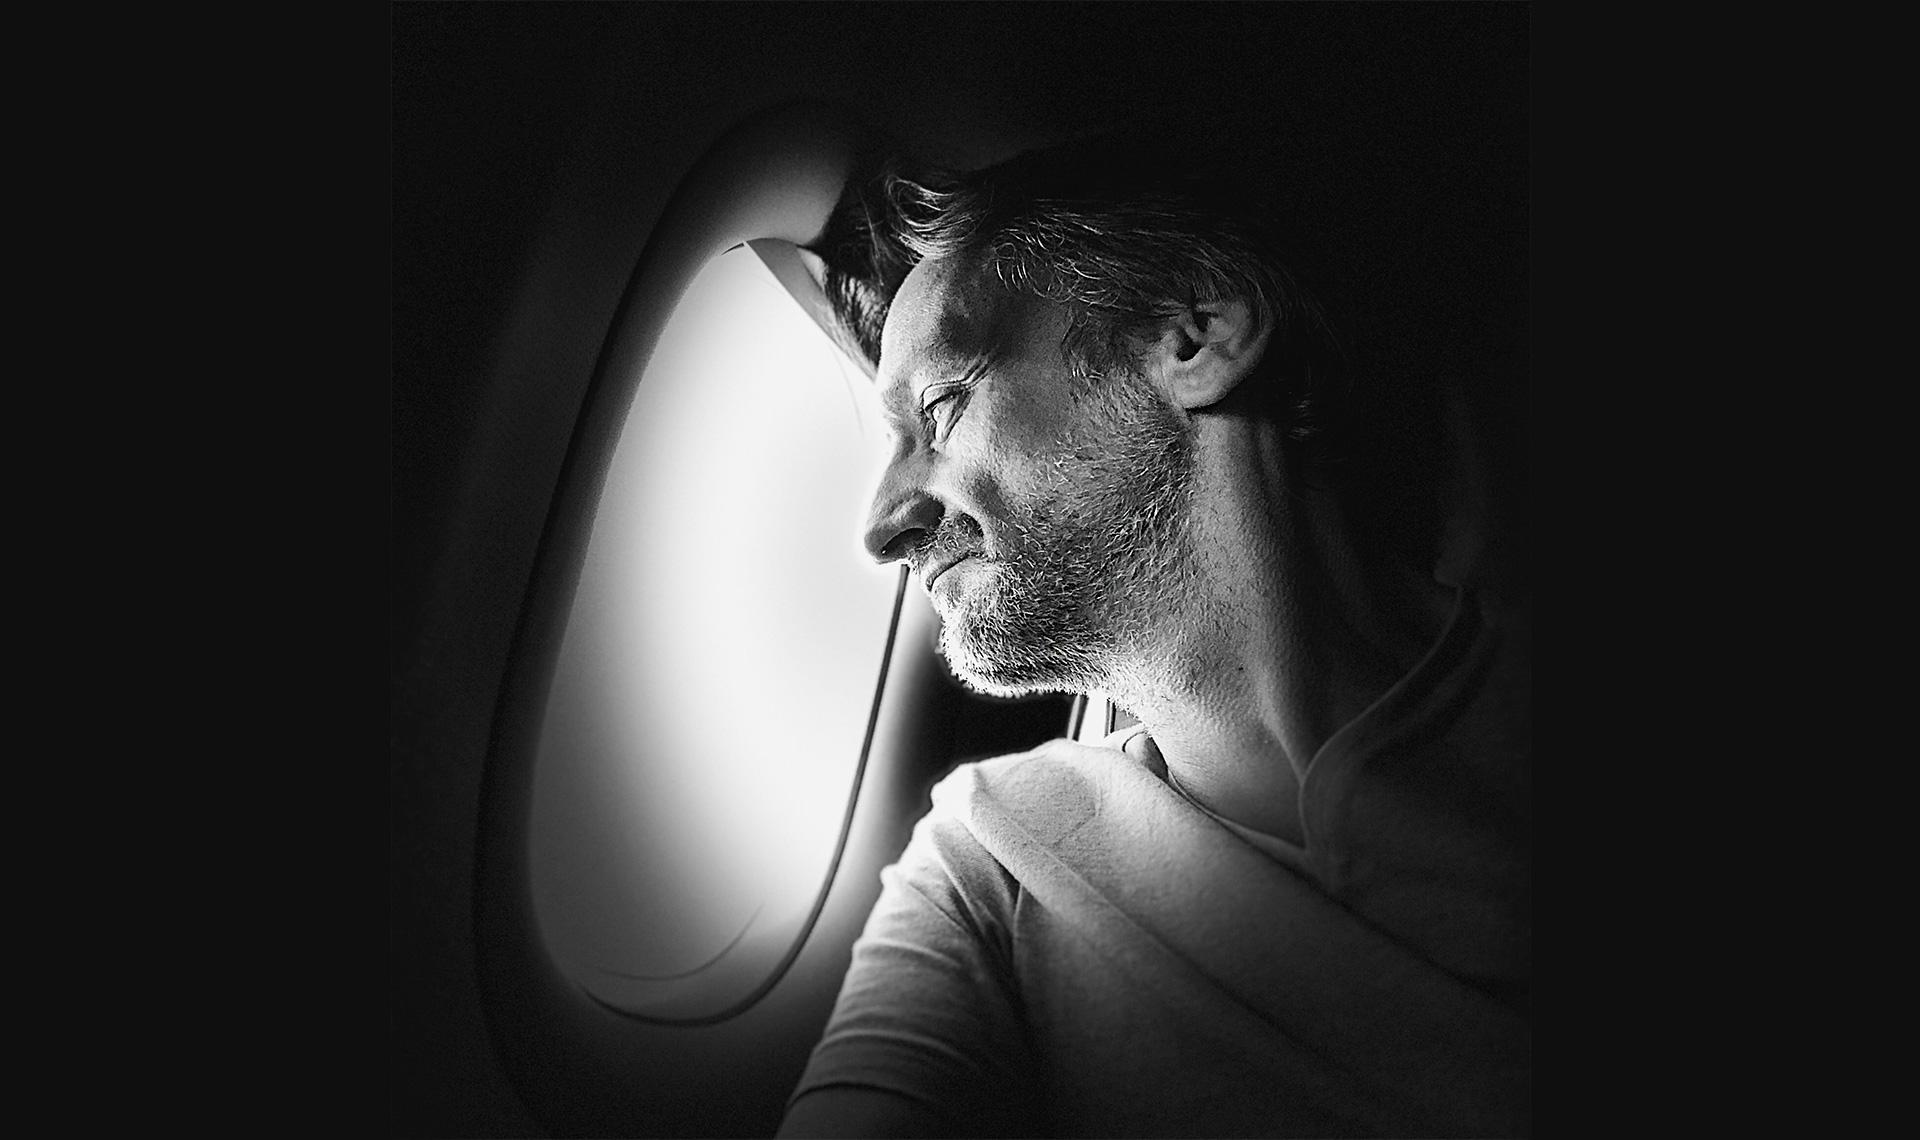 Стефан Жульяр: взгляд французского фотографа